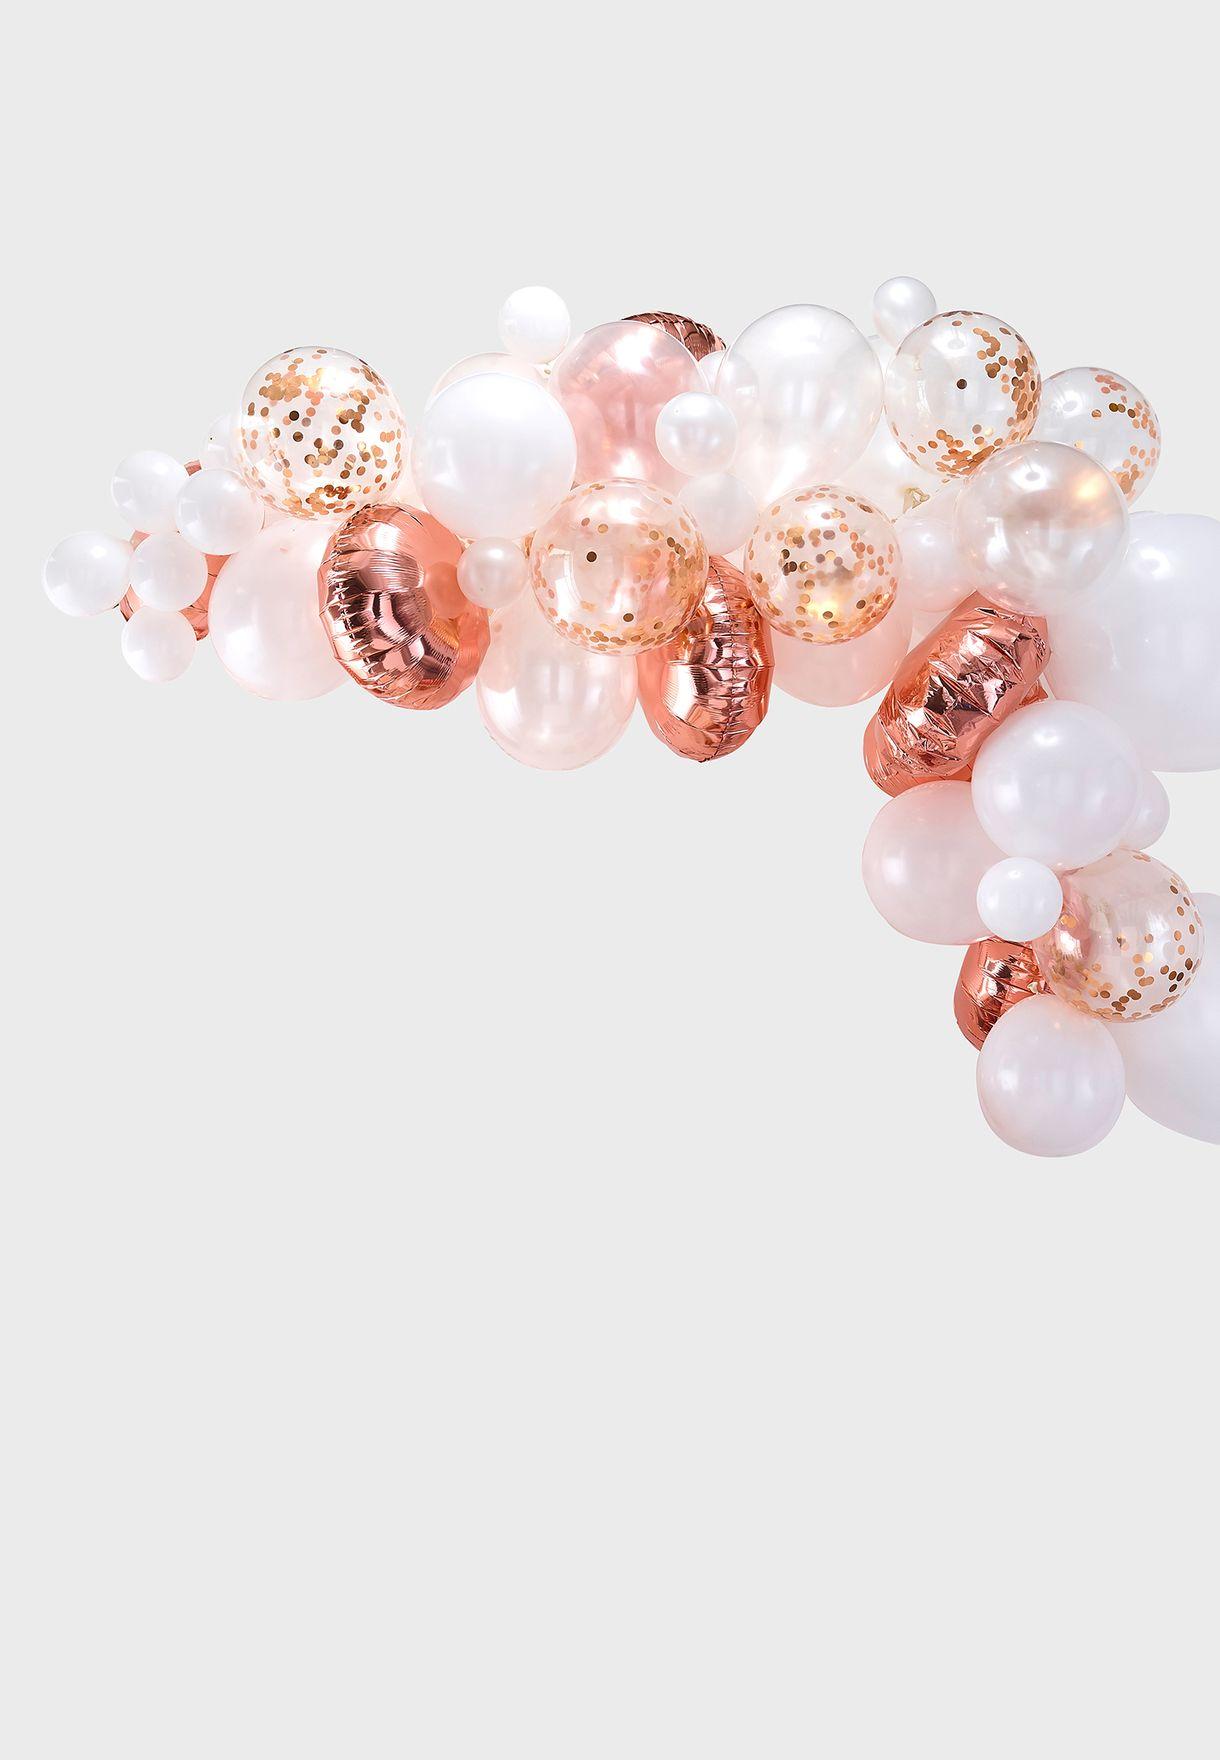 Balloon Arch - Rose Gold